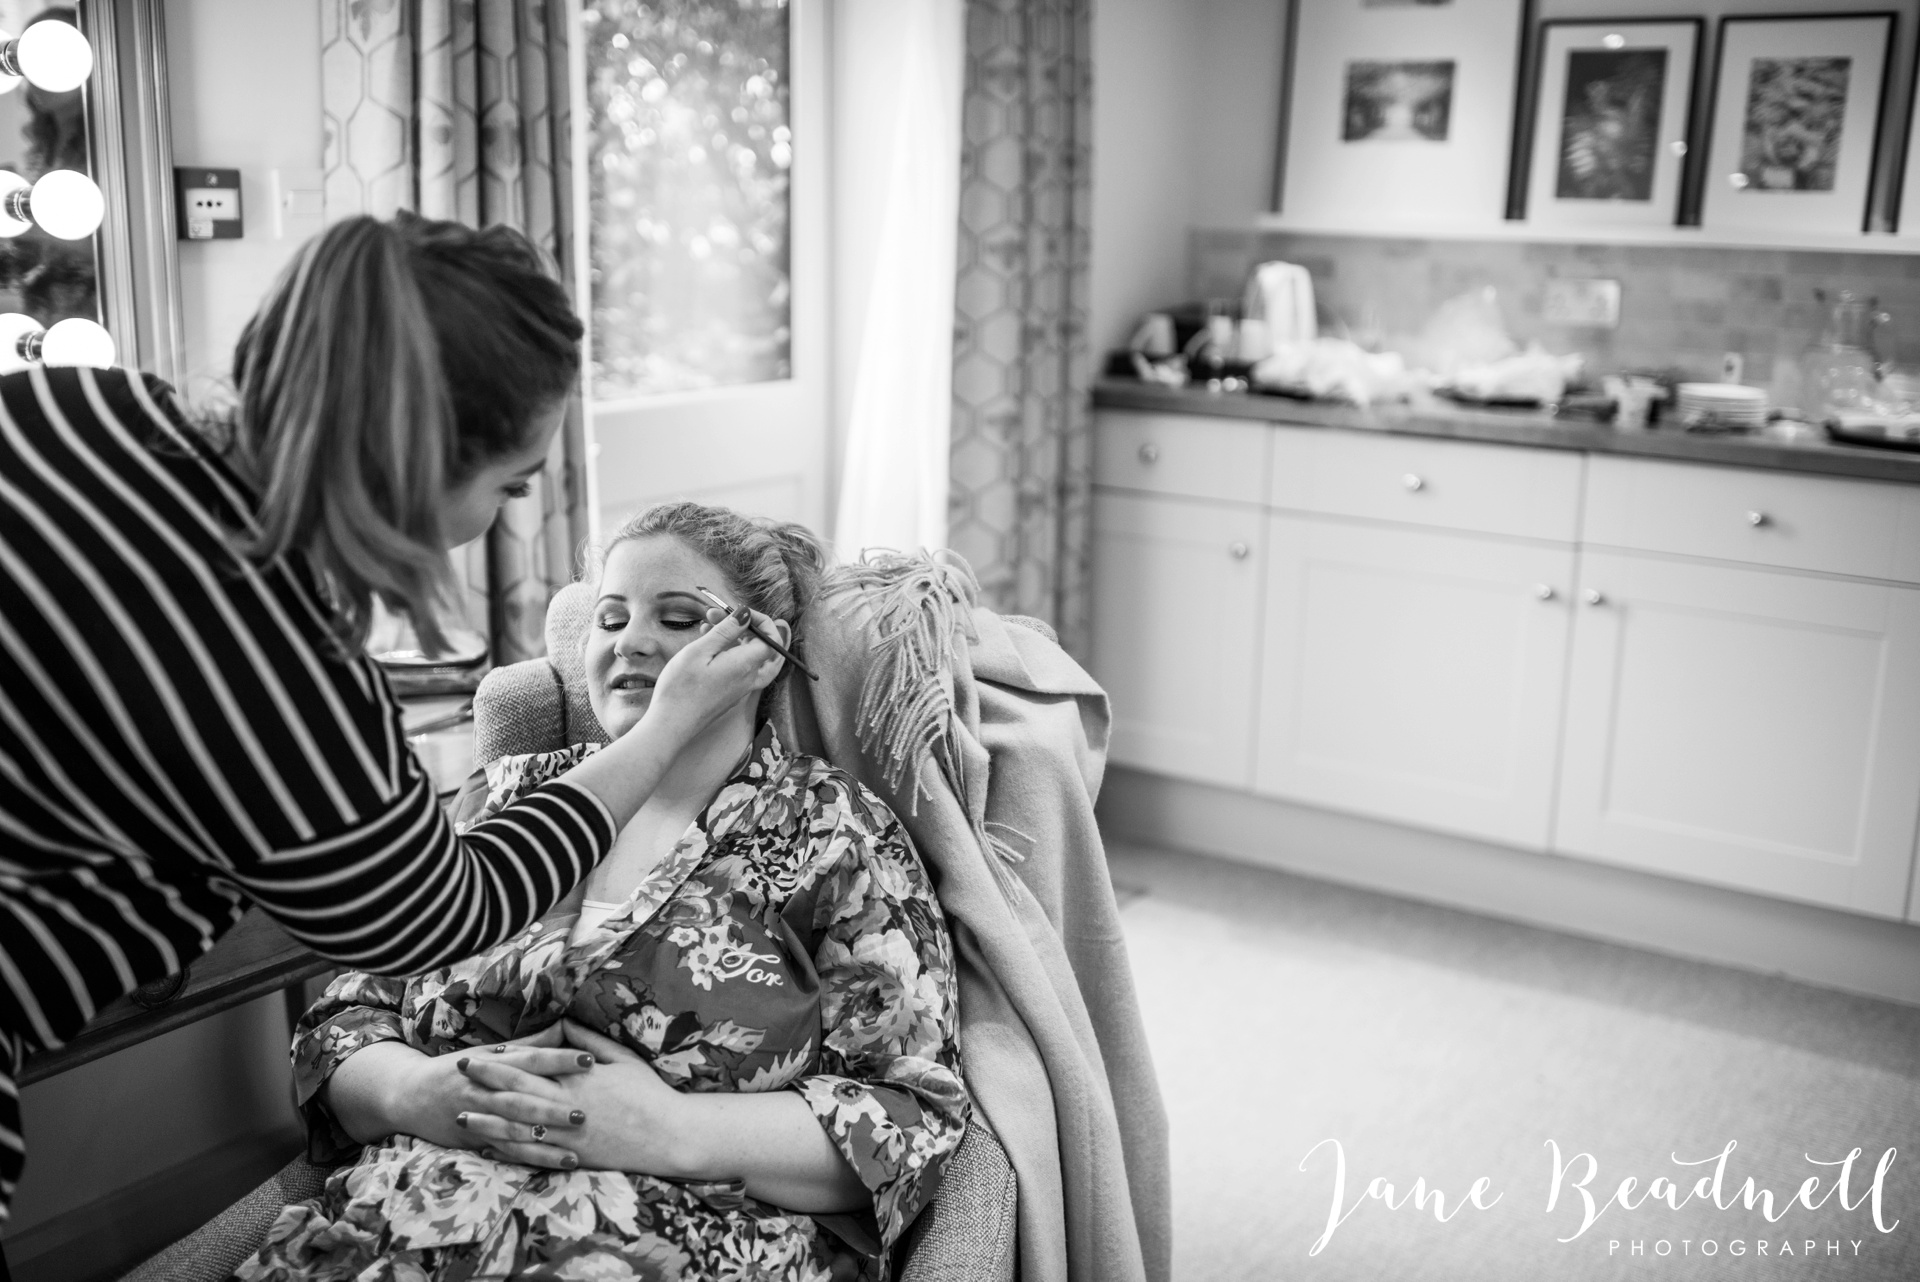 South Farm Wedding photography Hertfordshire by Jane Beadnell Photography fine art wedding photographer_0009